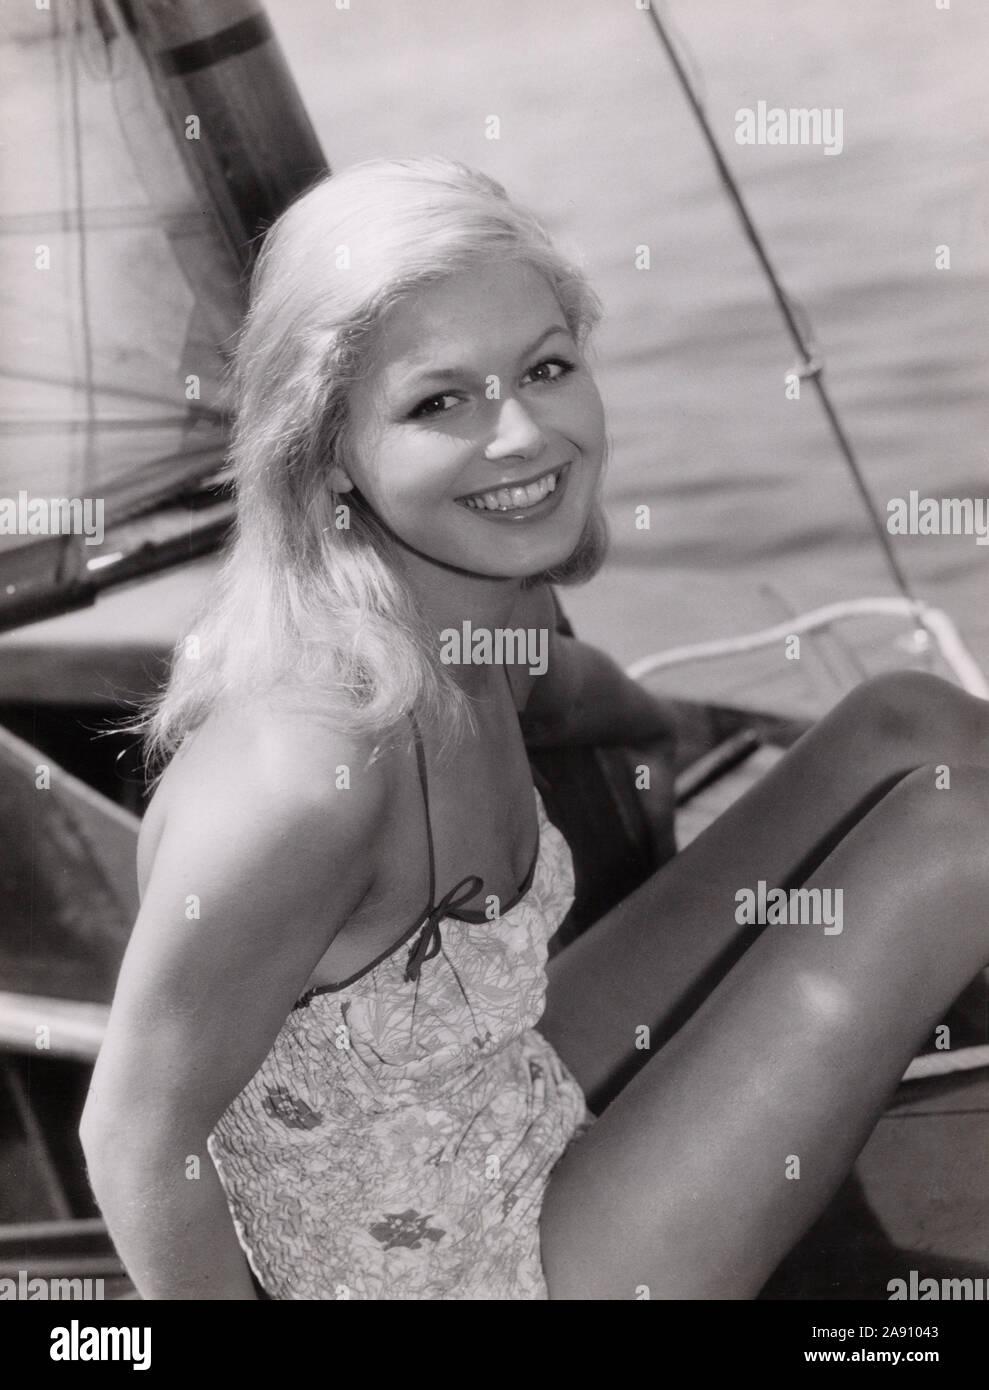 Gudula Blau, deutsche Schauspielerin, Deutschland ca. 1962. German actress Gudula Blau, Germany ca. 1962. Stock Photo